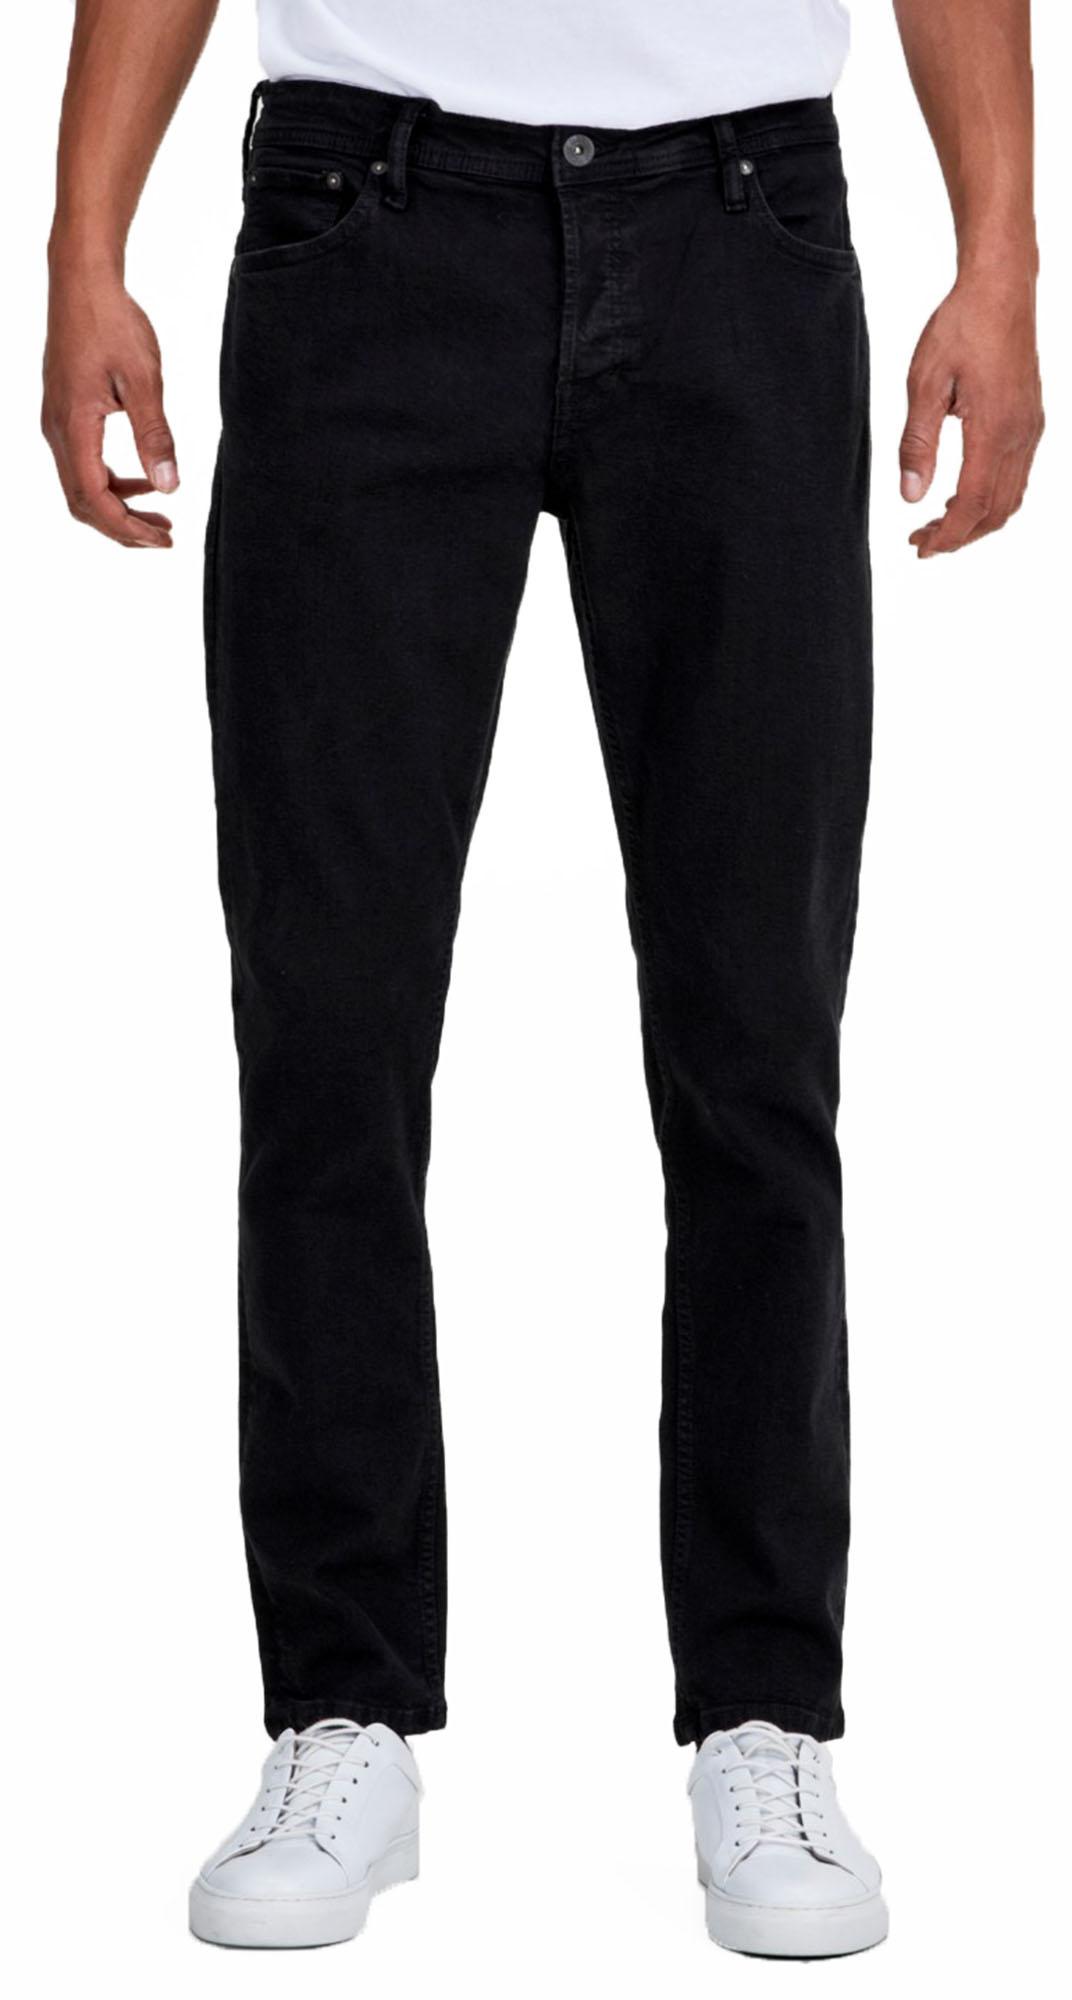 0d7afc59 JACK & JONES Jeans Mens Glenn Slim Fit Tapered Narrow Leg Denim ...